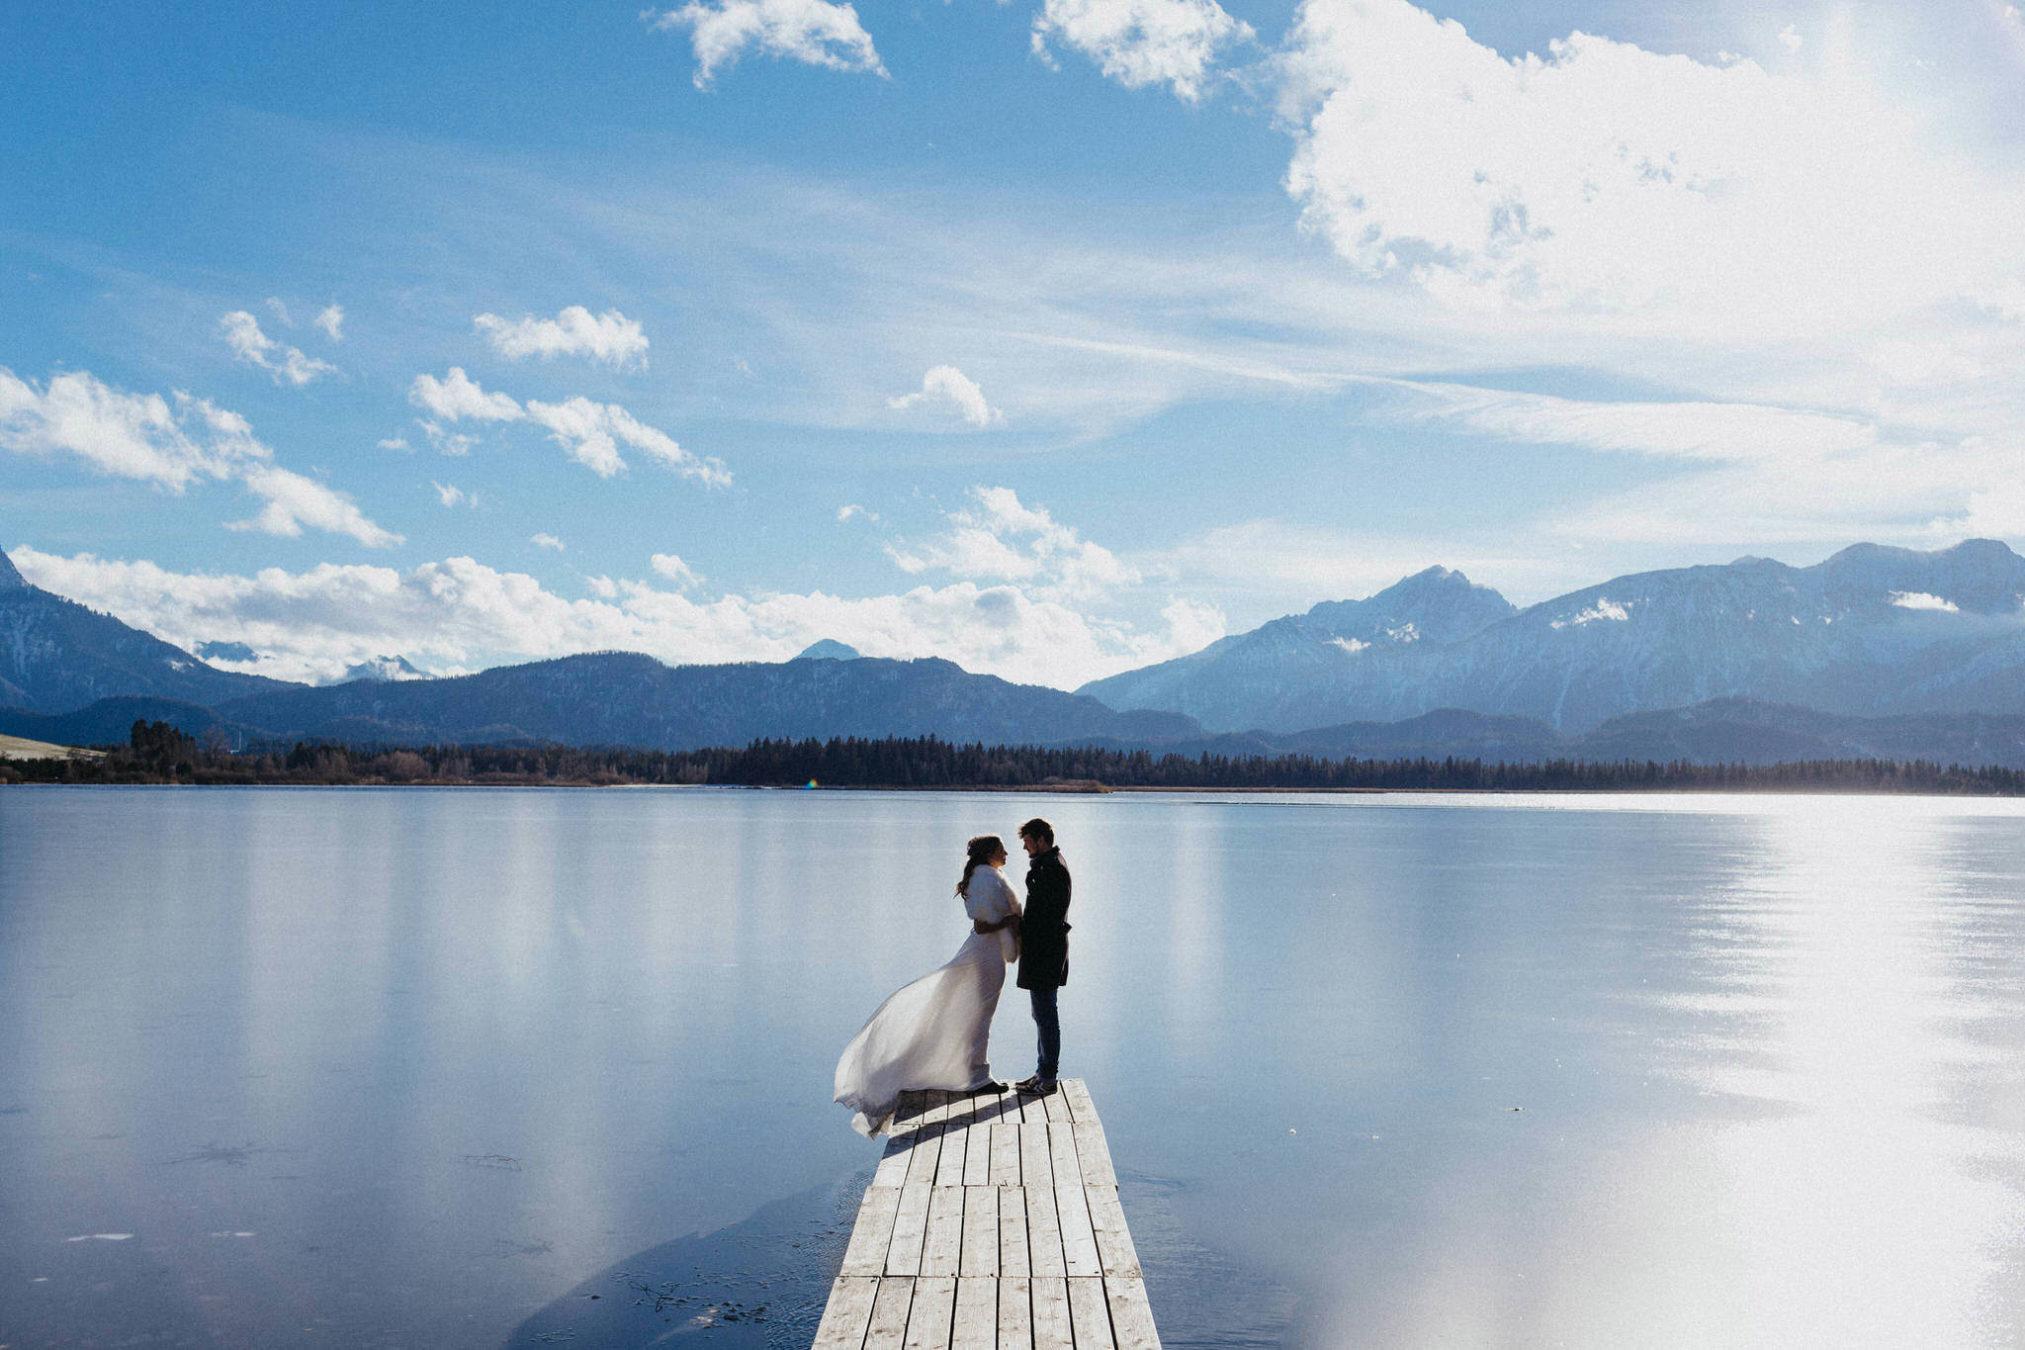 fotos de casamento no inverno